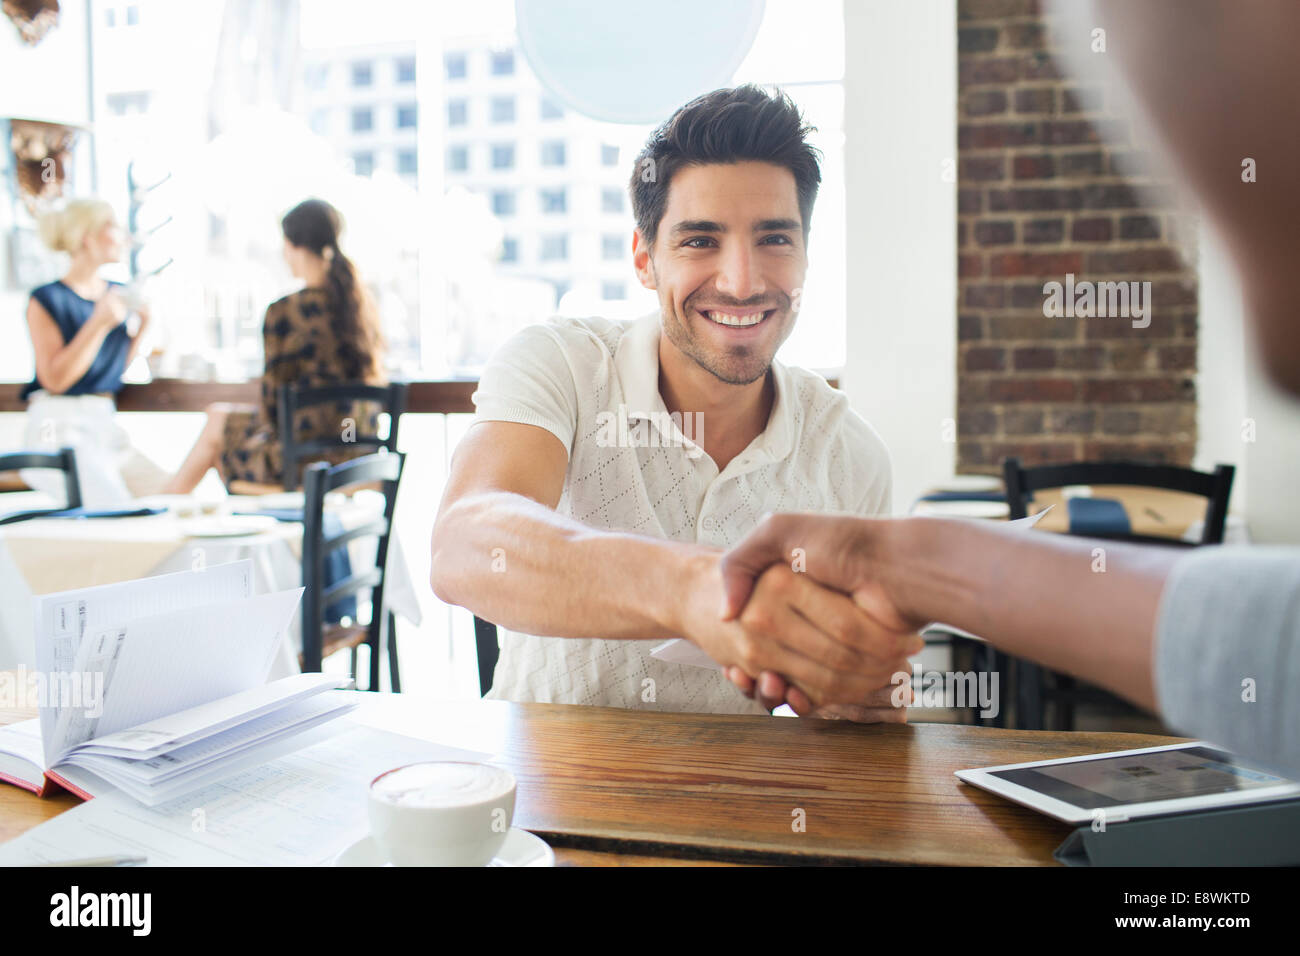 Businessmen shaking hands in cafe - Stock Image